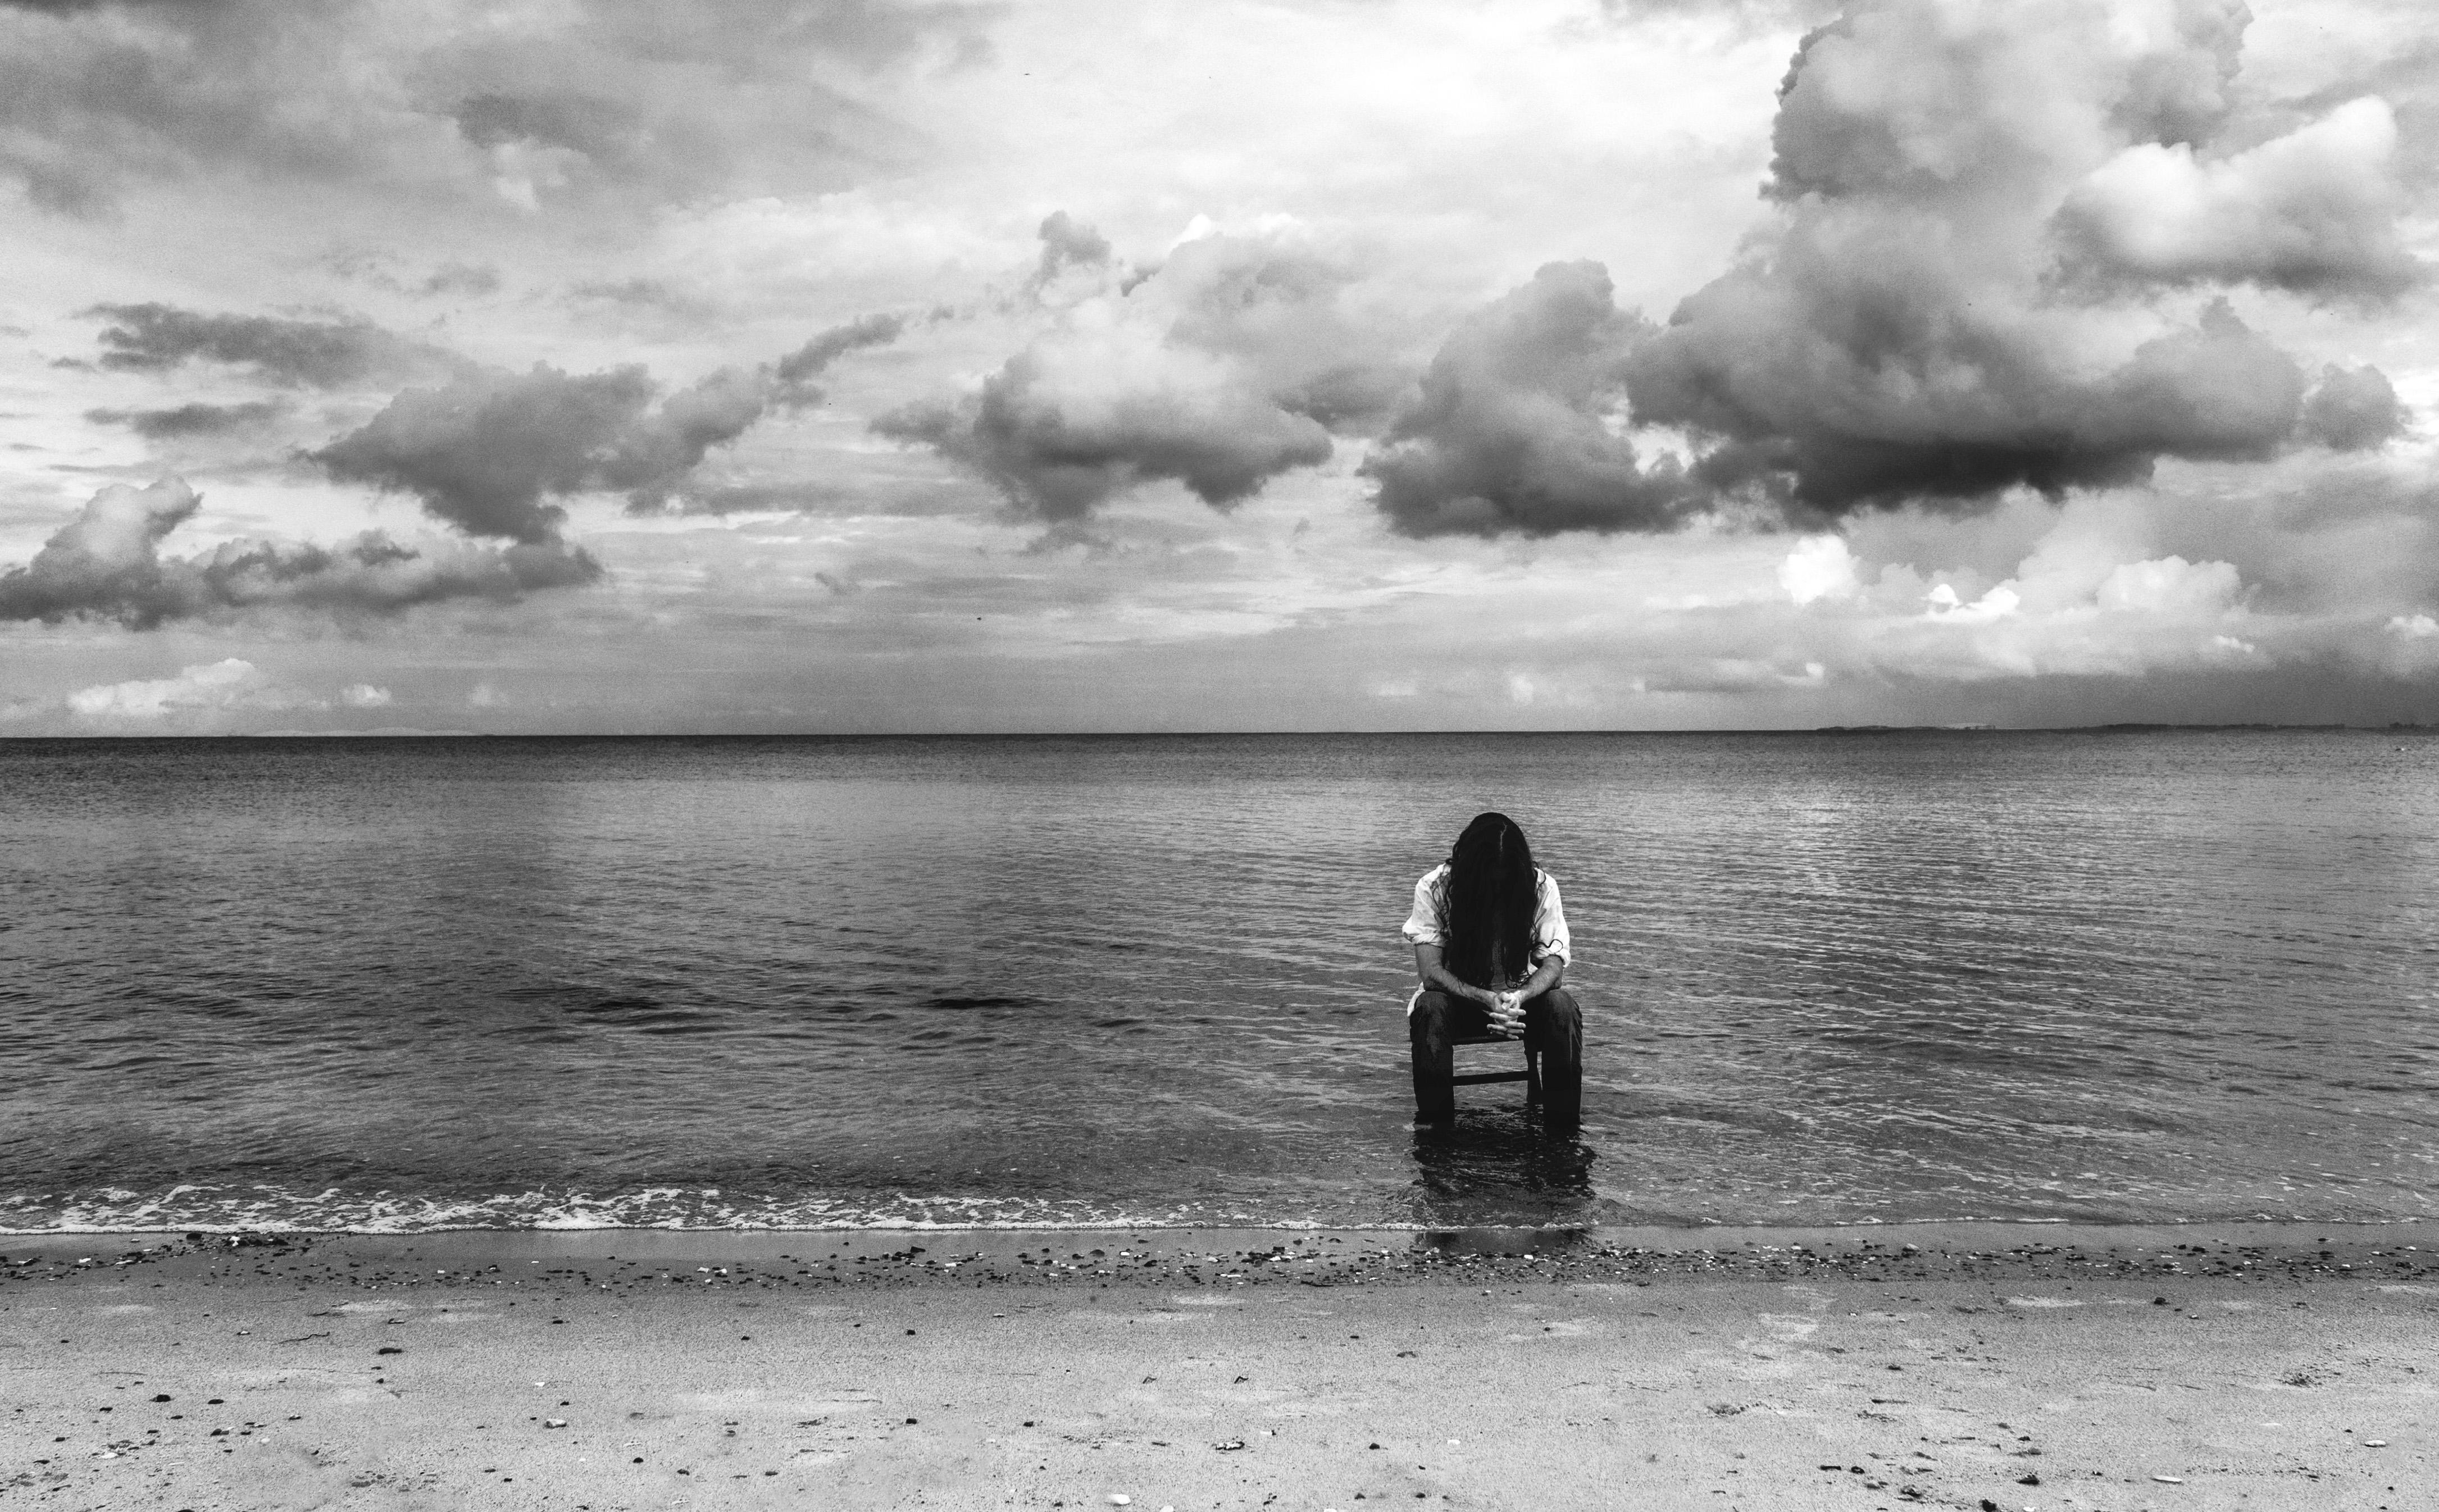 Man beach sea coast water sand ocean horizon cloud black and white sky white photography shore